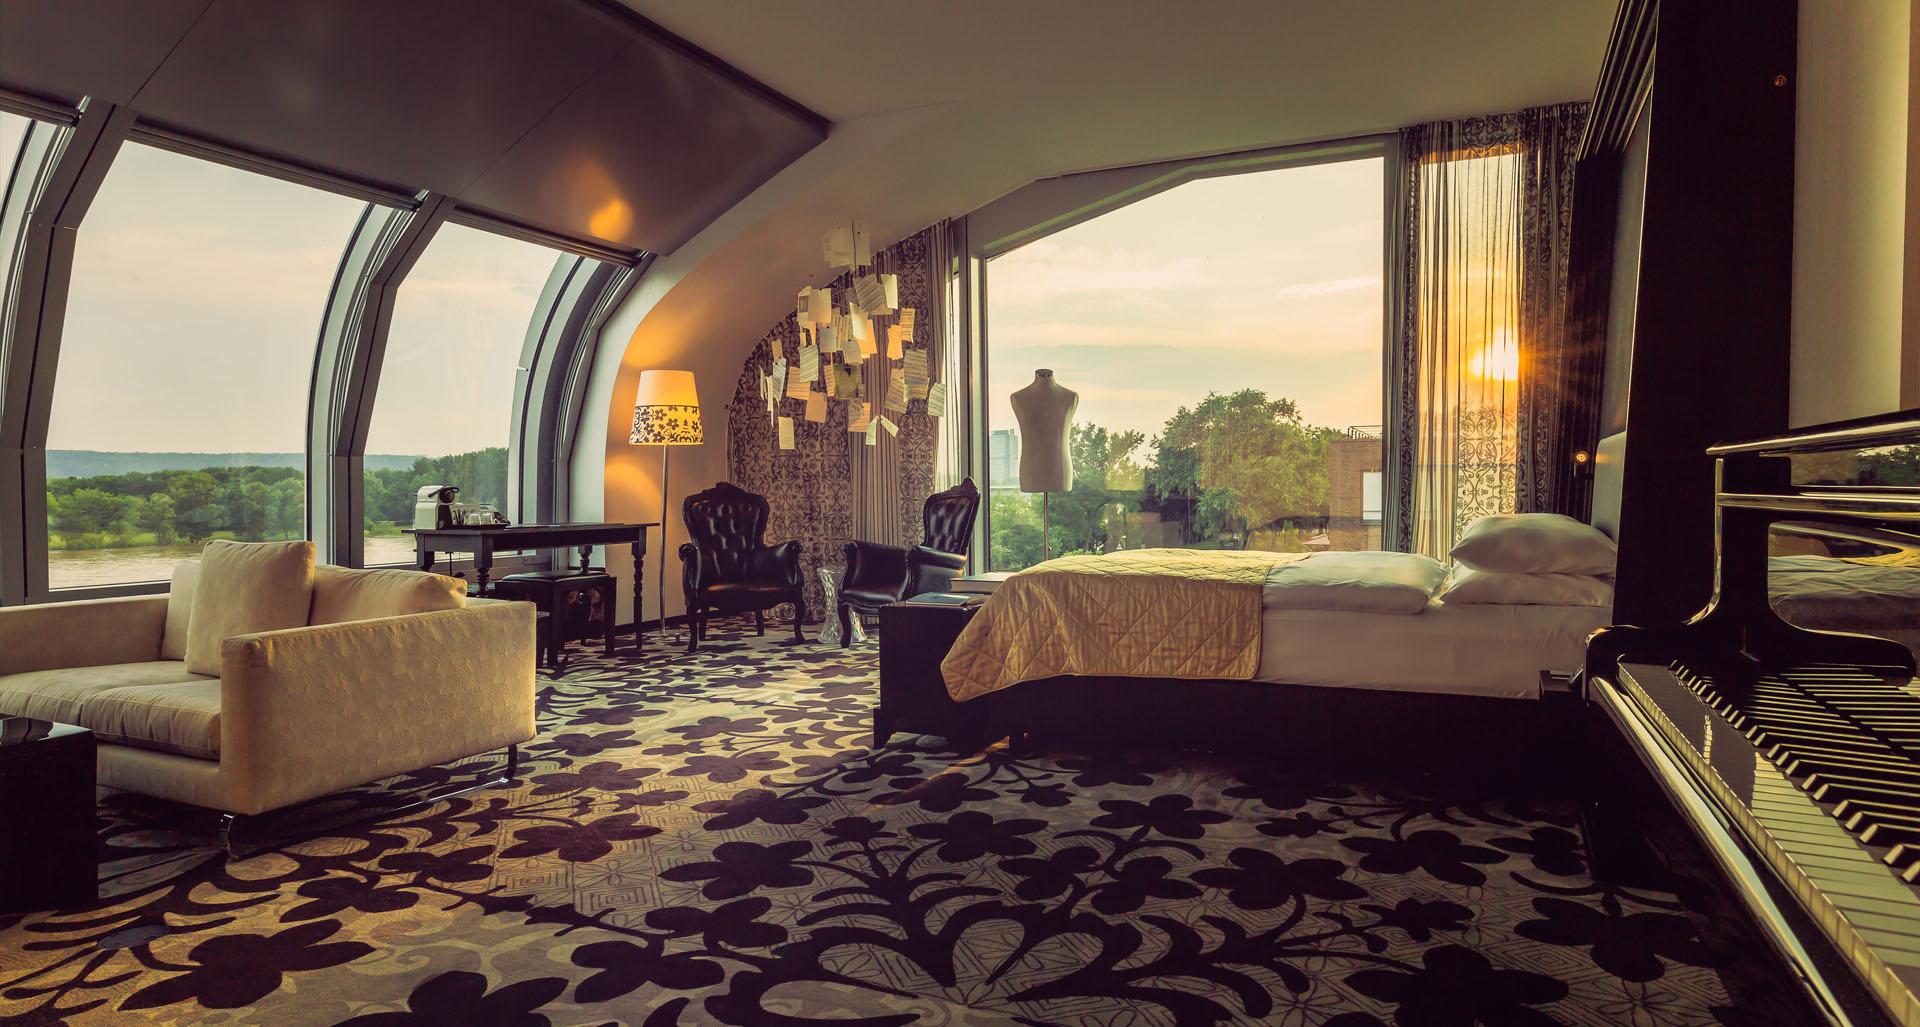 wellnesshotel nrw bildergalerie kameha grand bonn. Black Bedroom Furniture Sets. Home Design Ideas